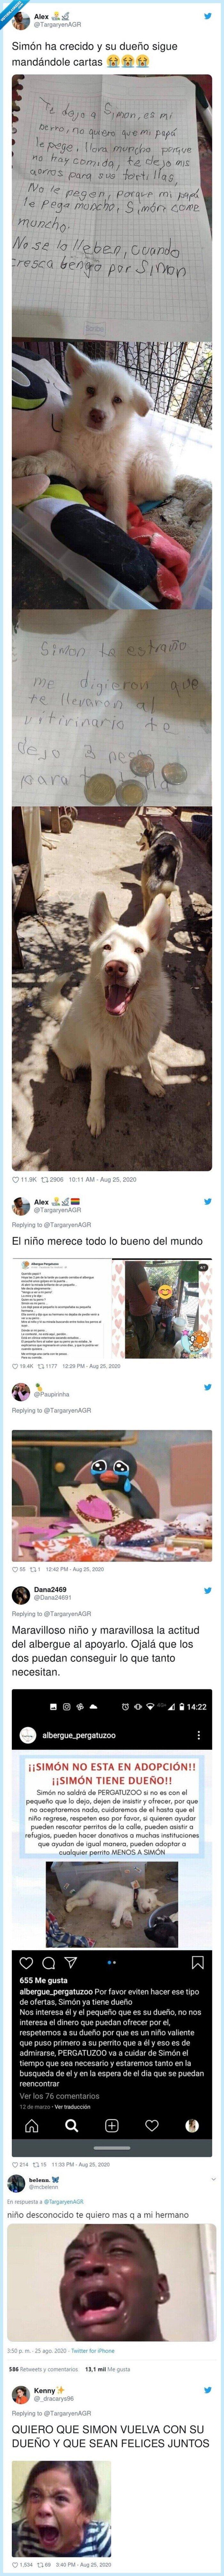 albergue,niño,perro,pesos,simón,twitter